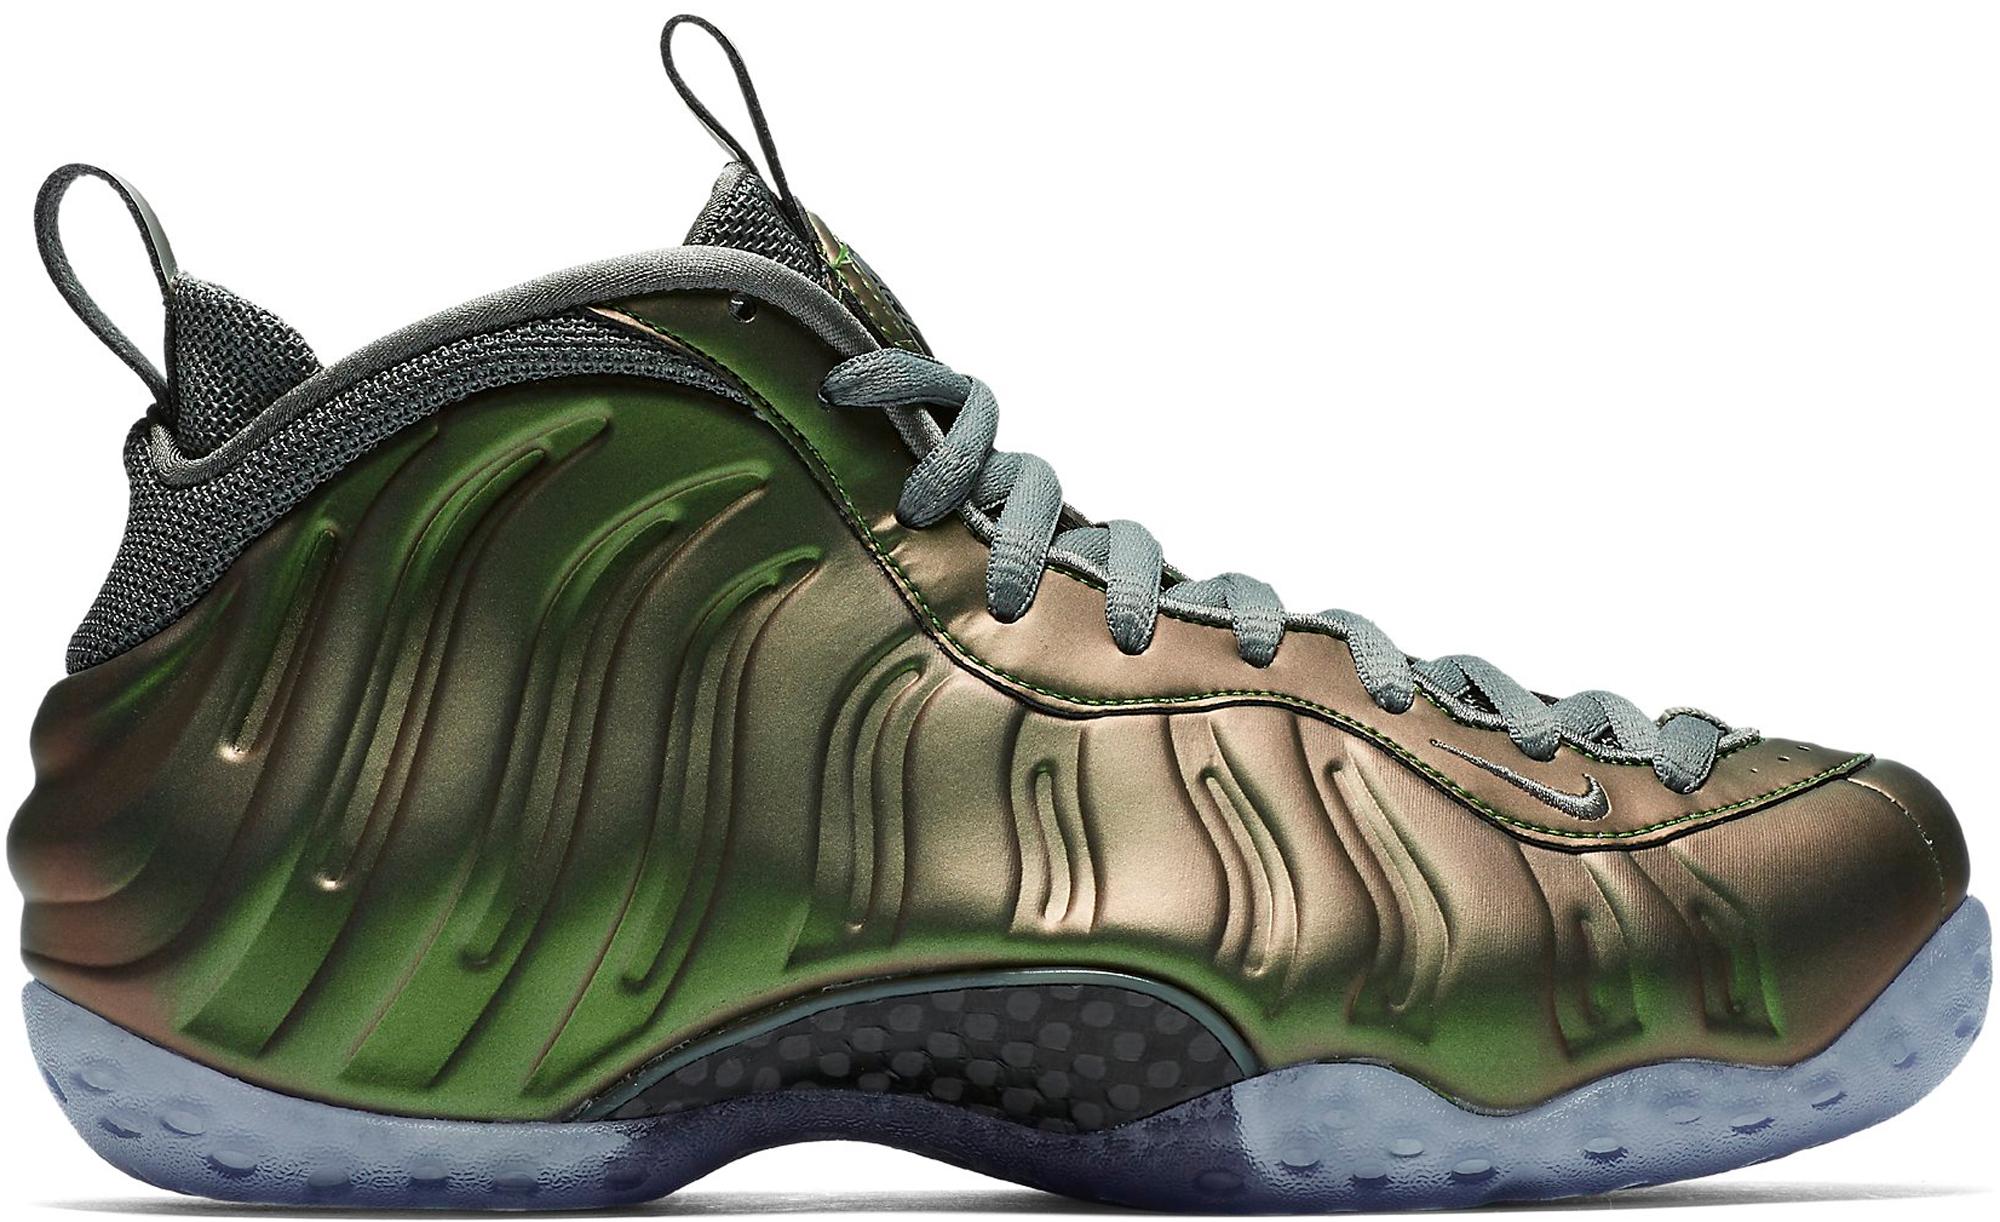 Nike Air Foamposite One NRG Sneakersfarfetch